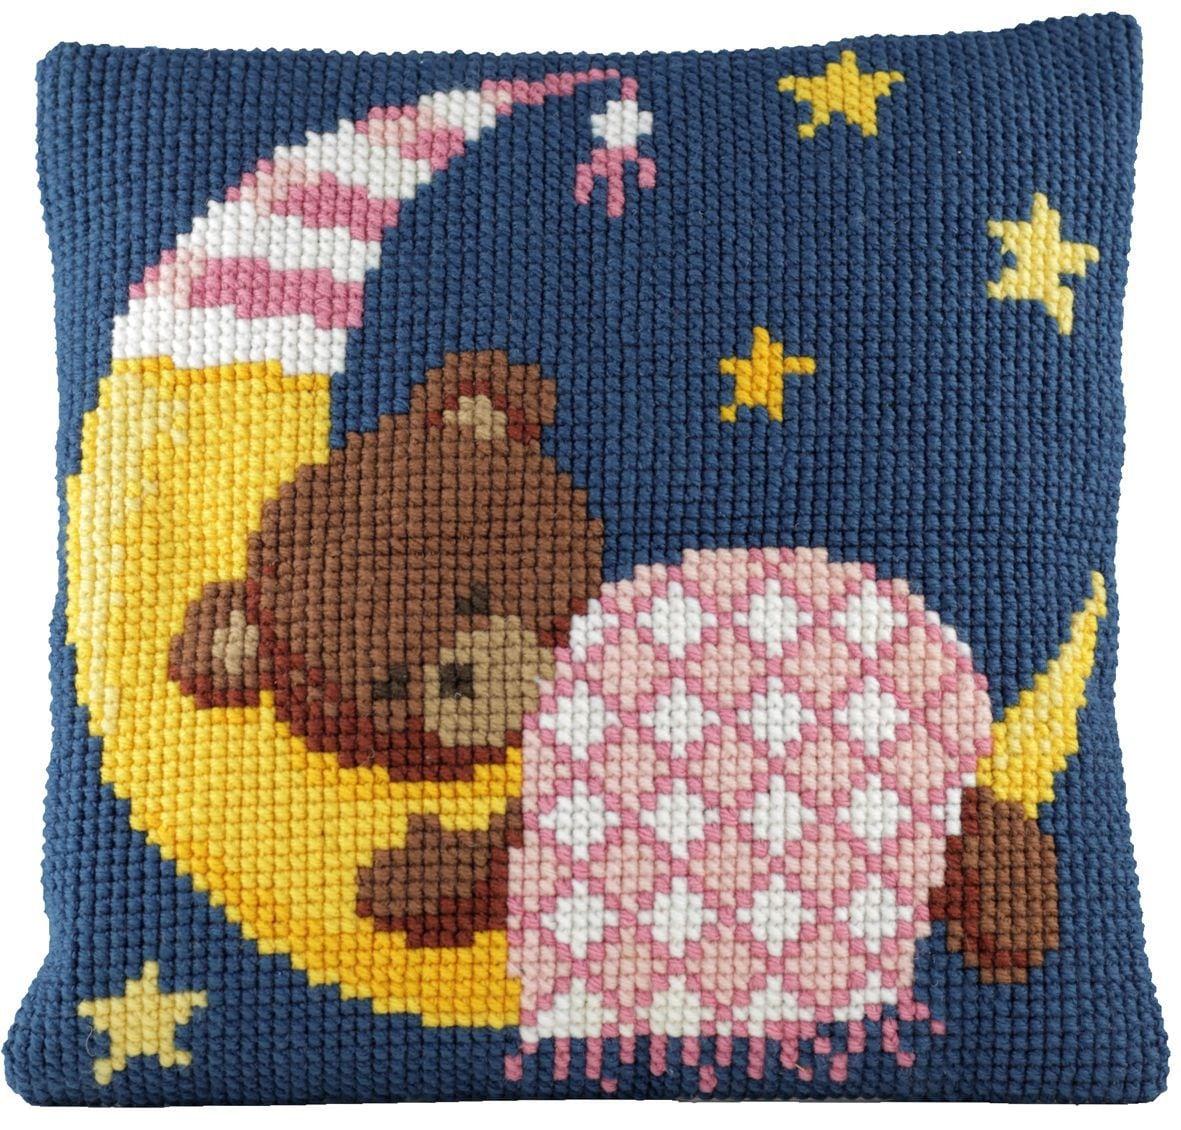 cross stitch cushion sleeping bear pink printed